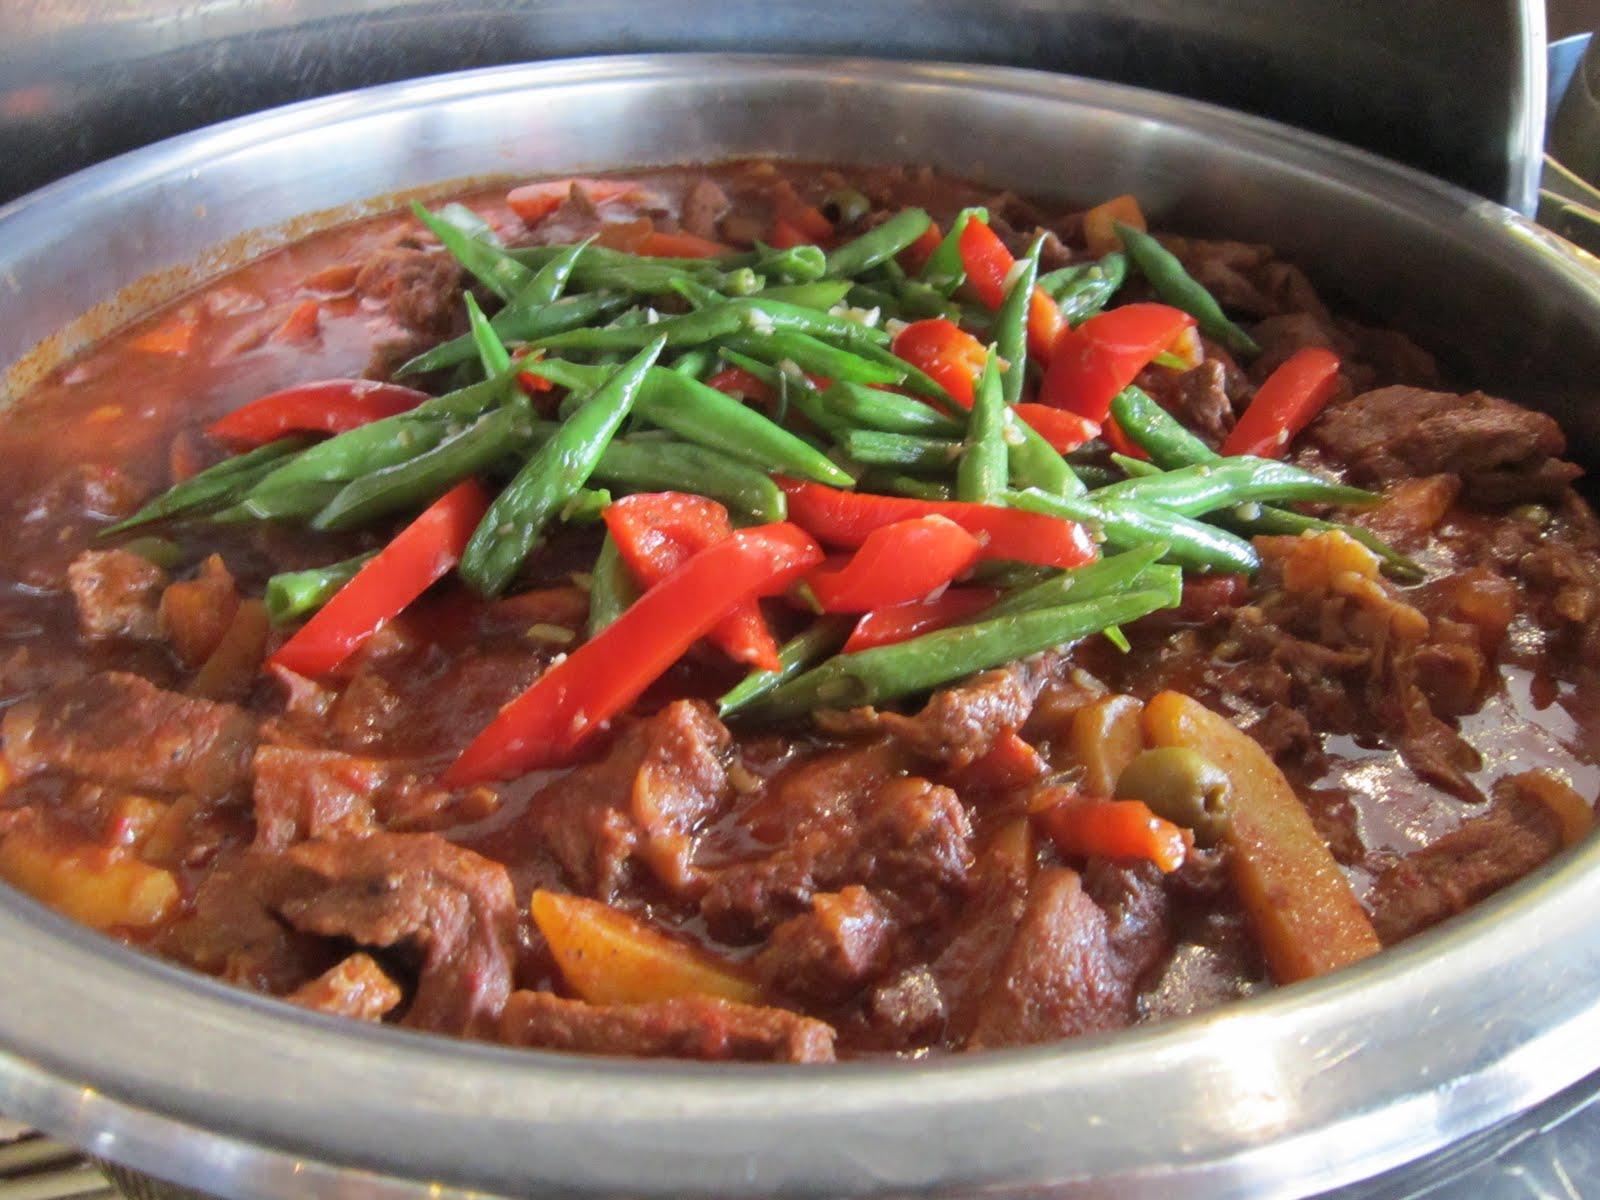 7107 flavors filipino cuisine for 7107 flavours philippine cuisine